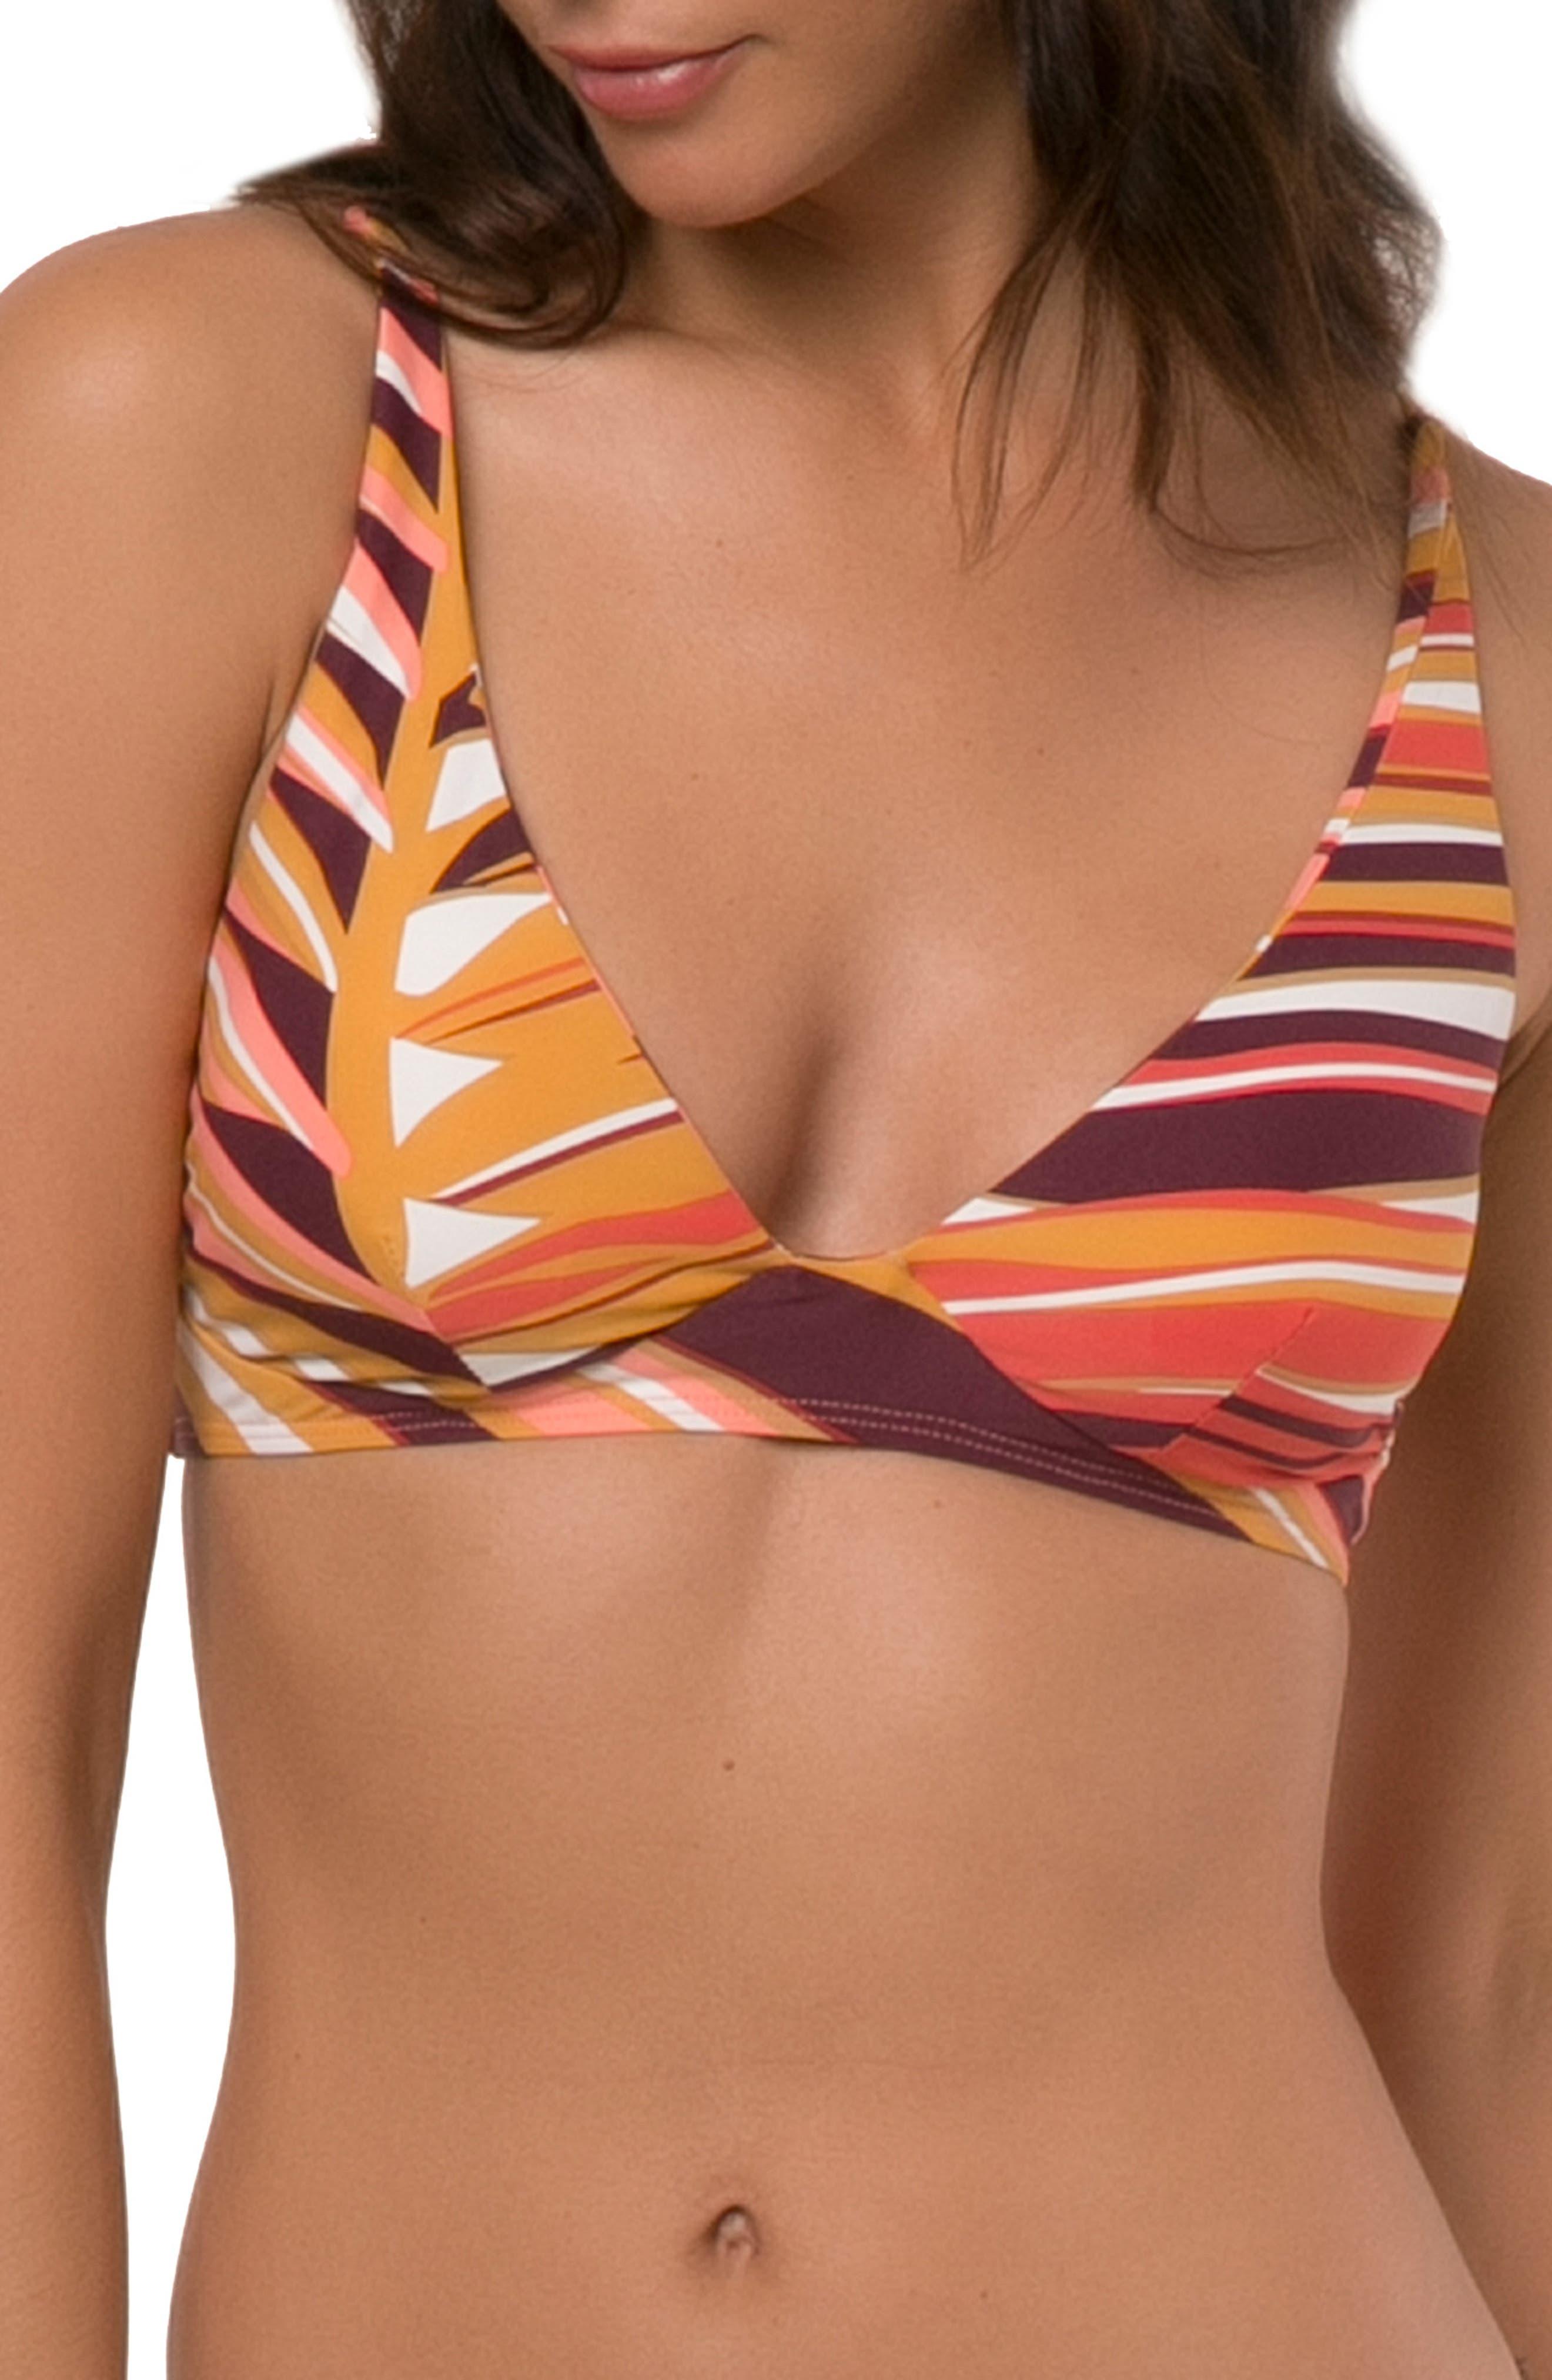 Anacapa Bikini Top,                             Main thumbnail 1, color,                             PURPLE MAUVE